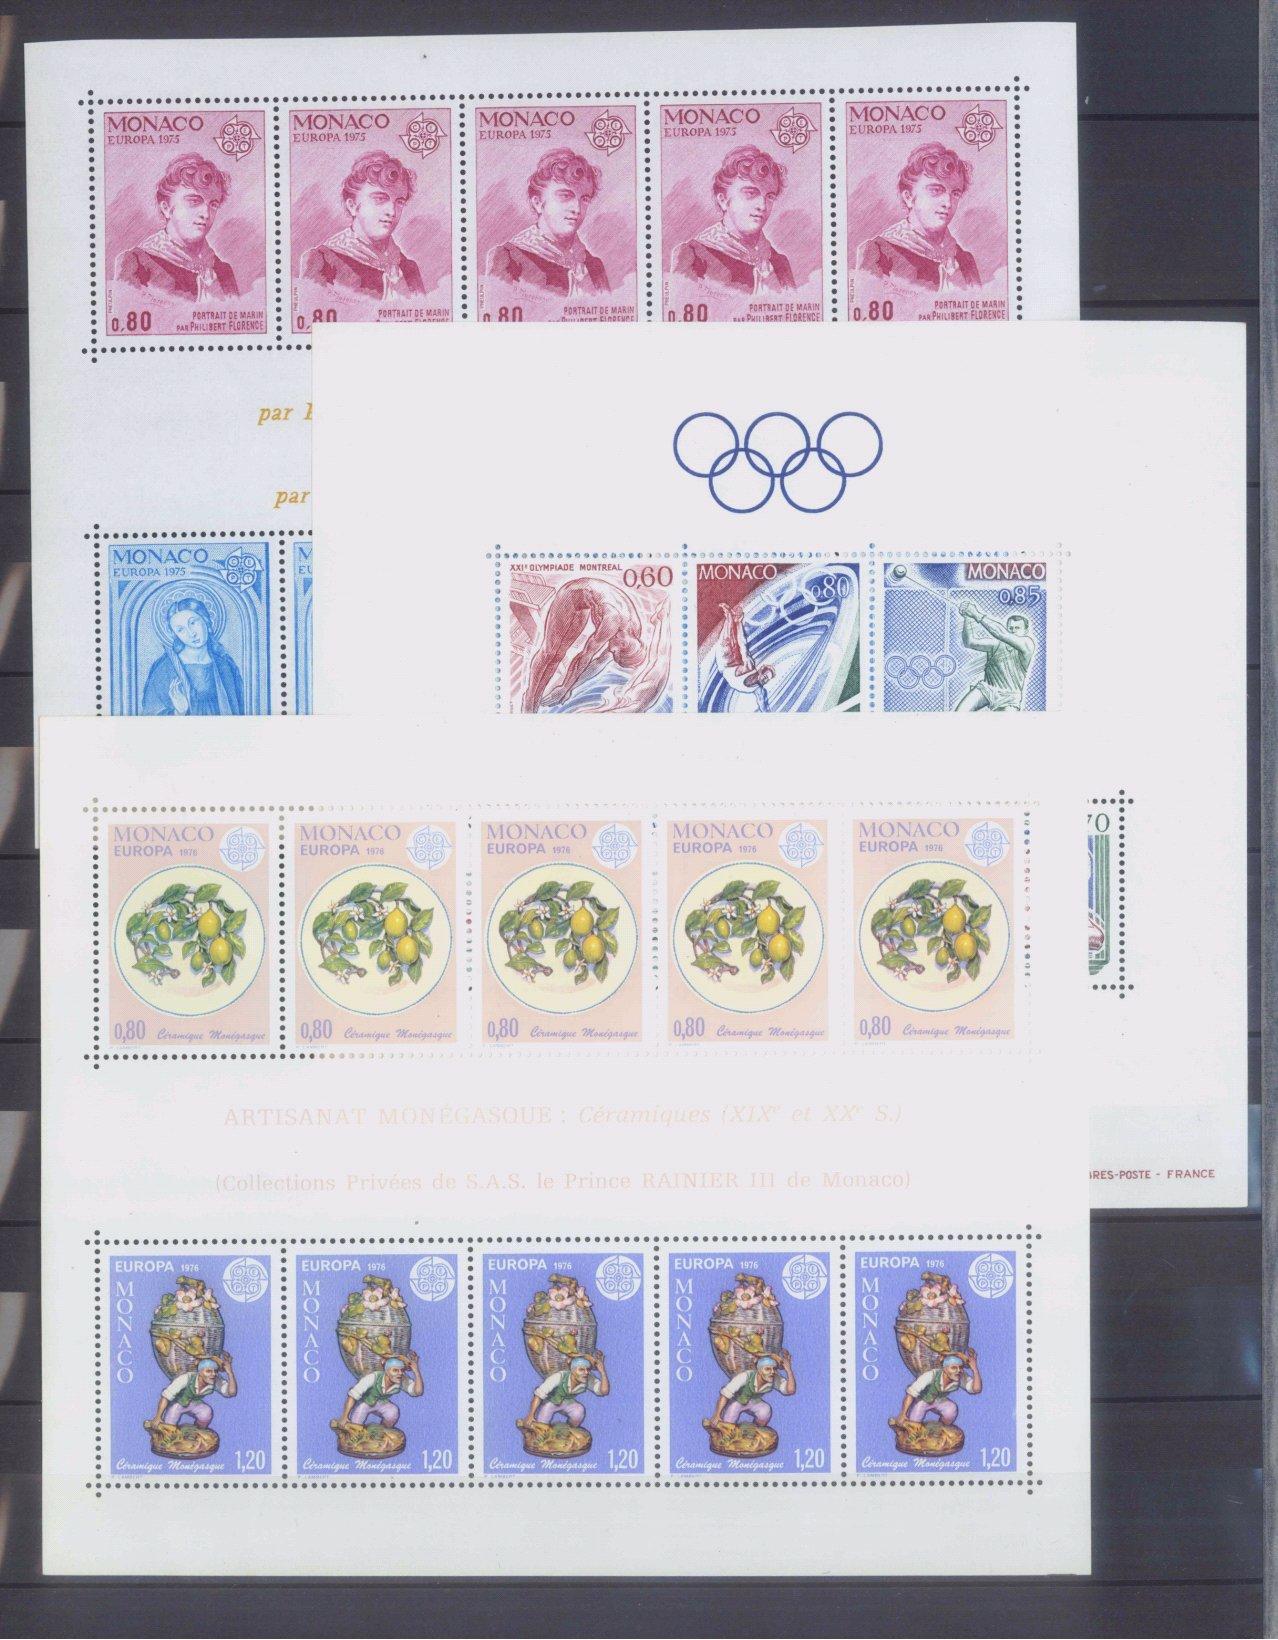 MONACO 1953-1989, Katalogwert 970,- Euro-1